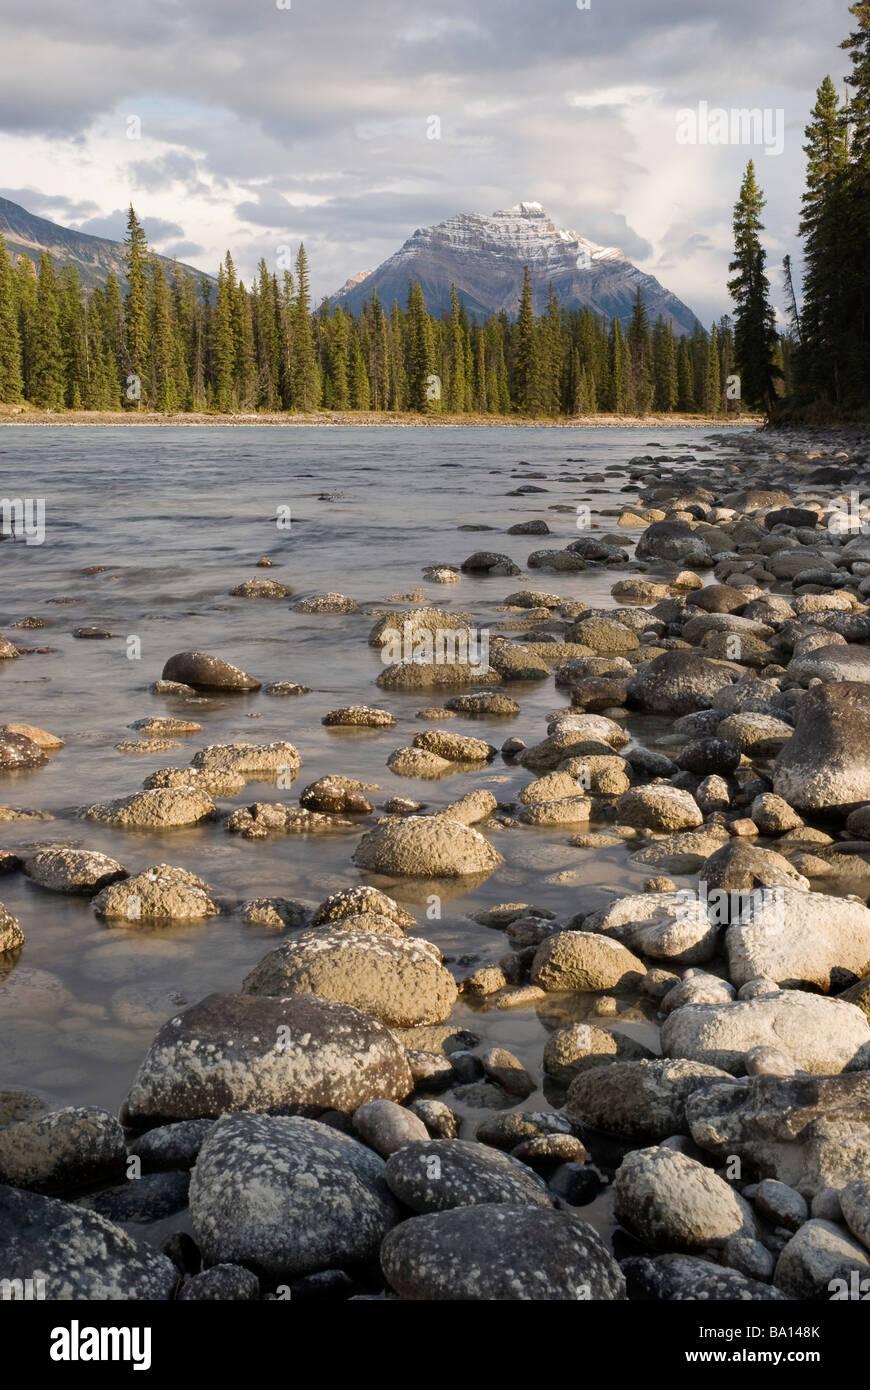 Mount Kerkeslin, Jasper, Alberta, Canada - Stock Image